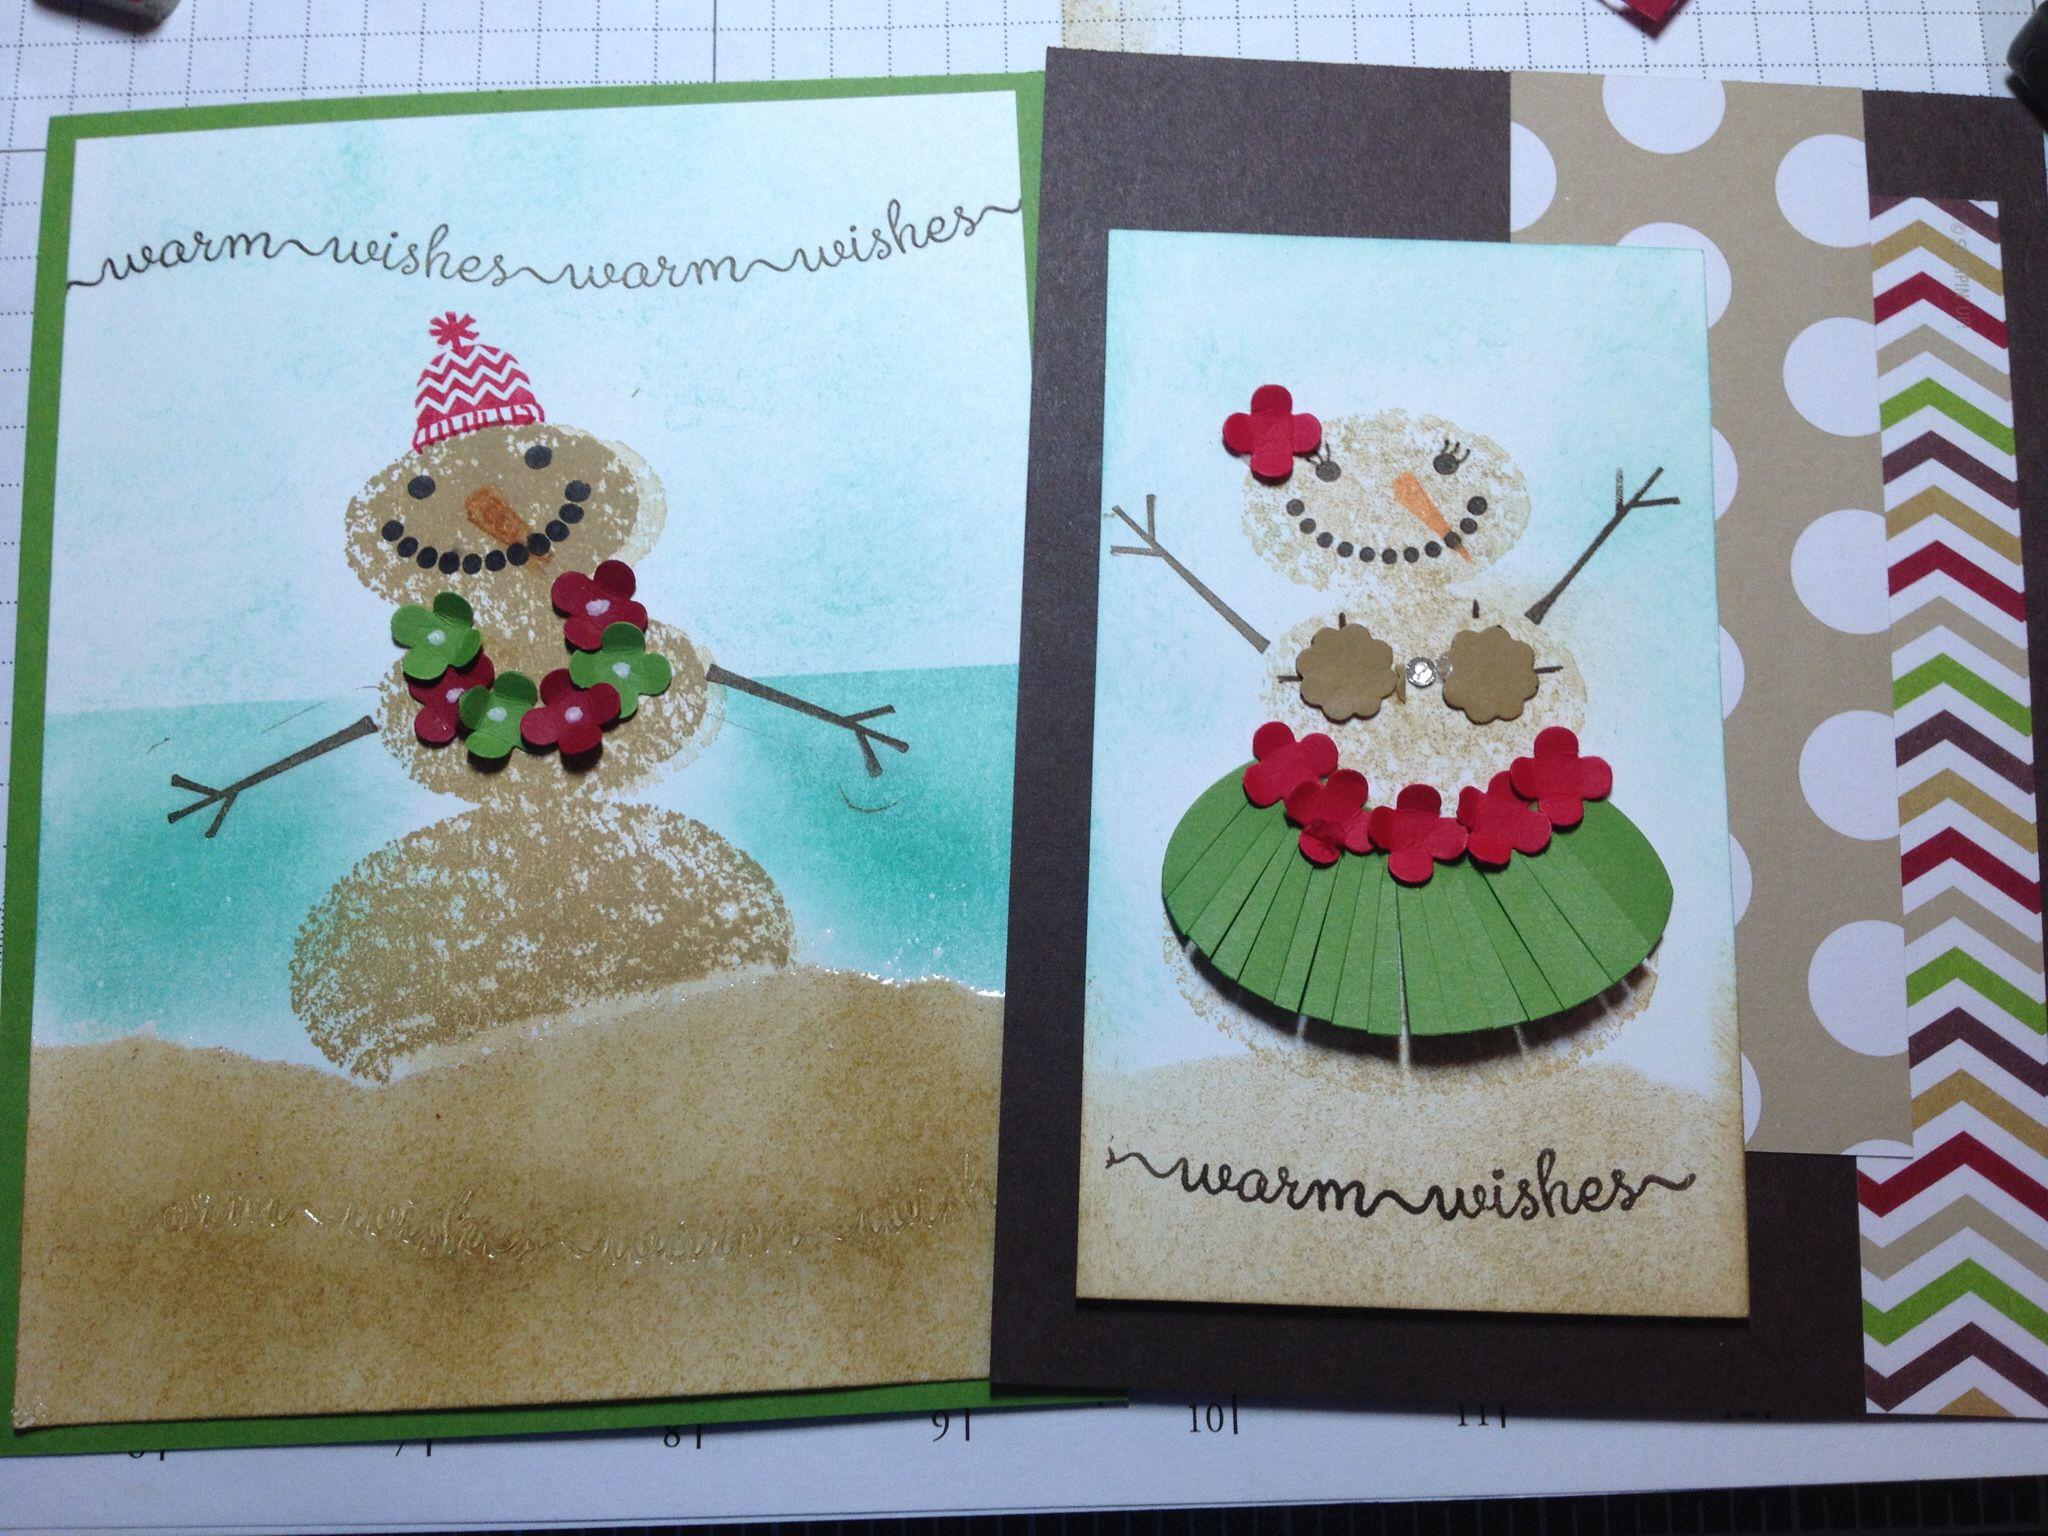 More Fun With Sandman Hi Day Greeting Cards My Original Creations